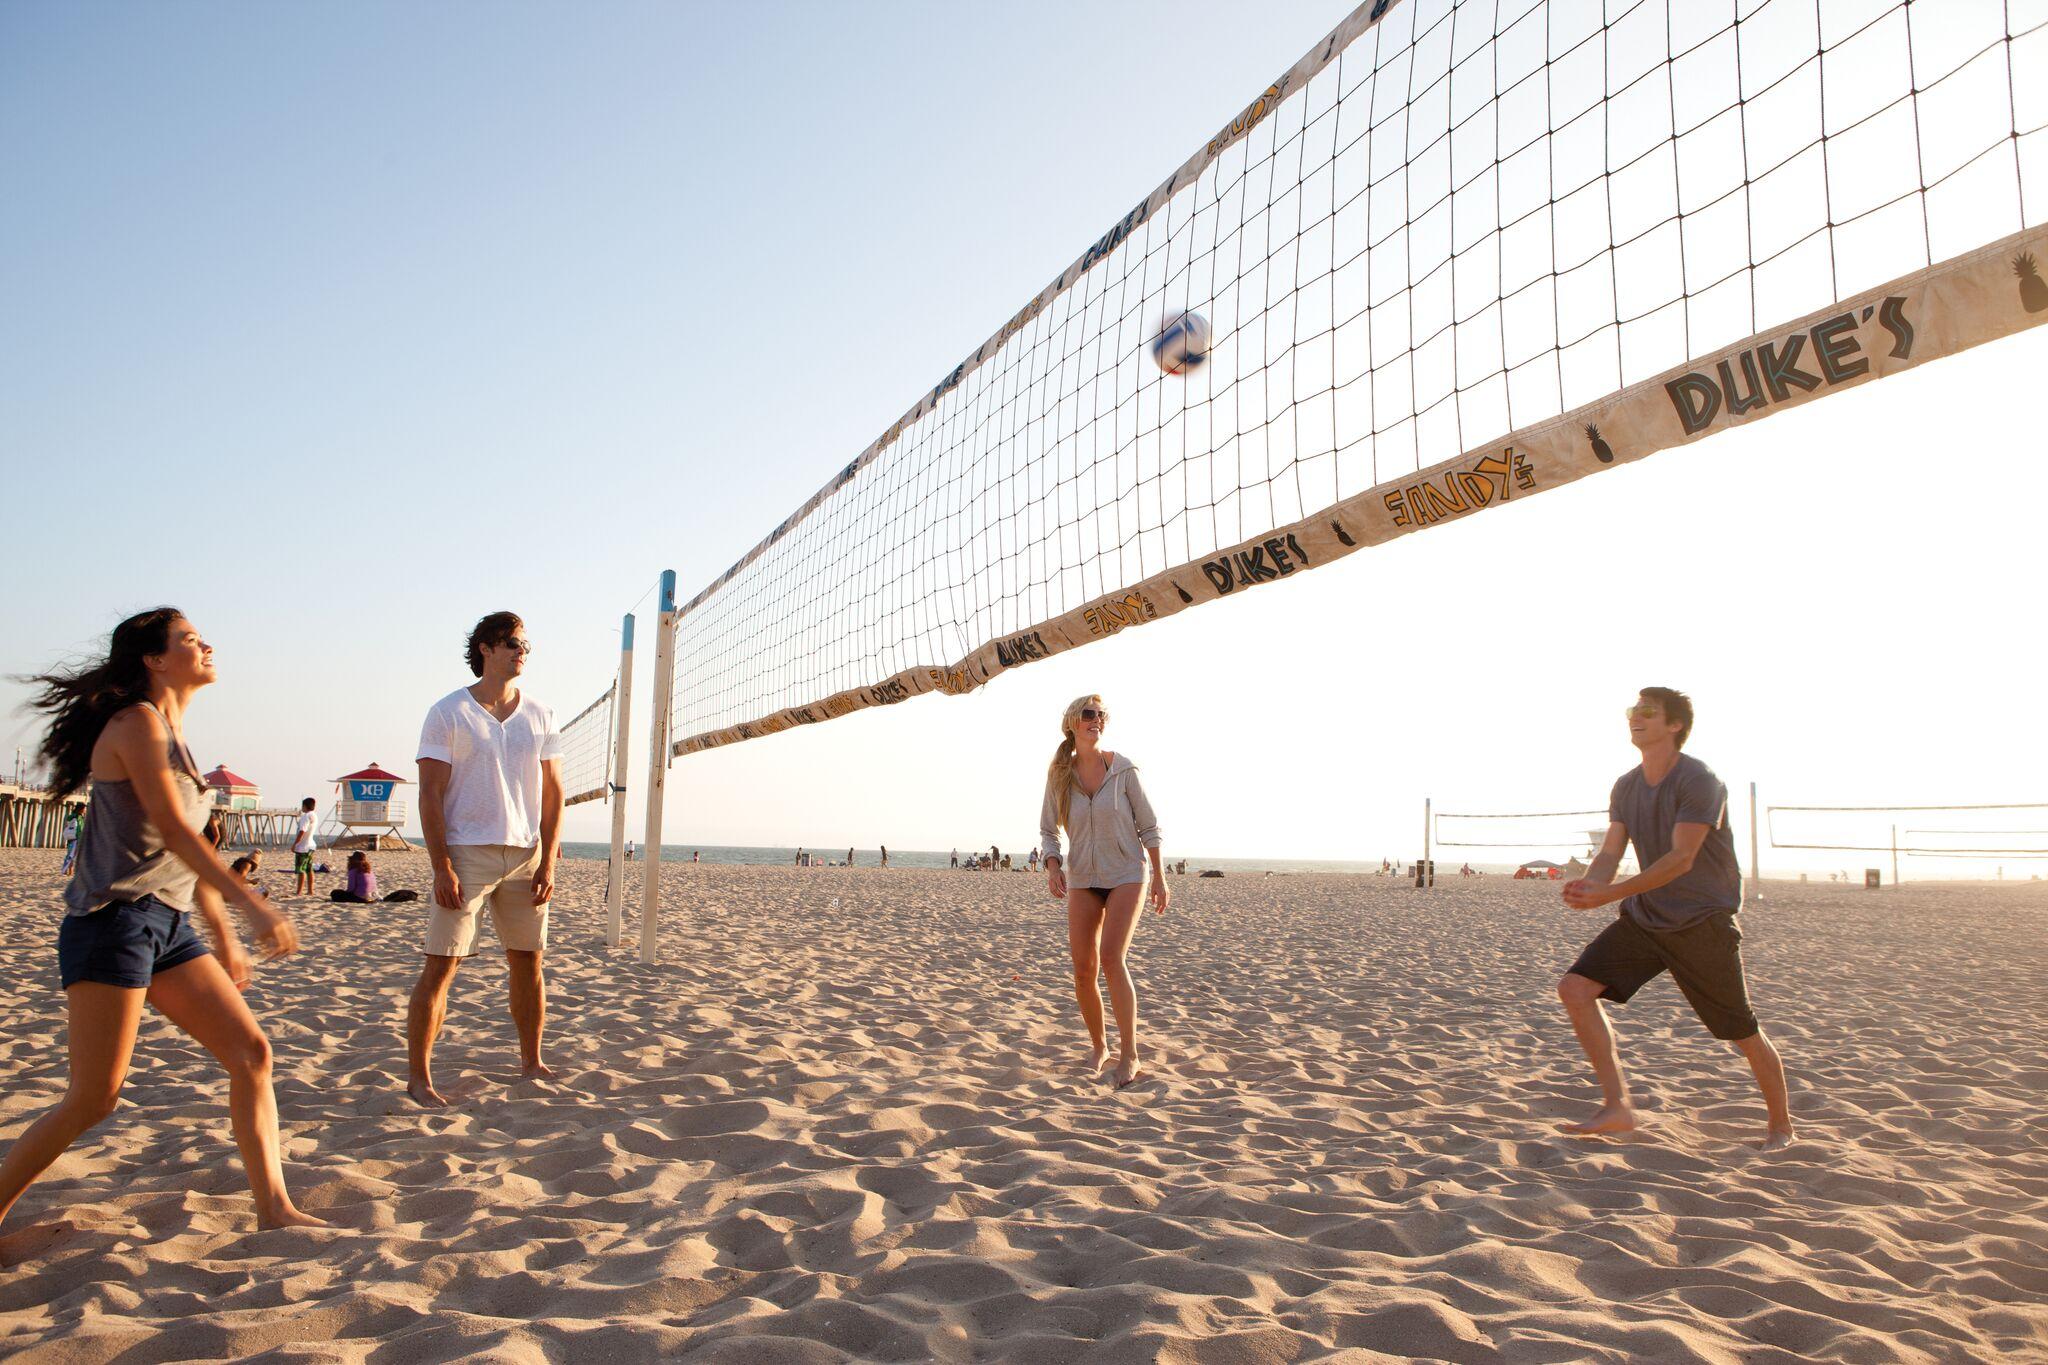 fb0dc7eddc1 Beach Volleyball in Huntington Beach | Surf City USA